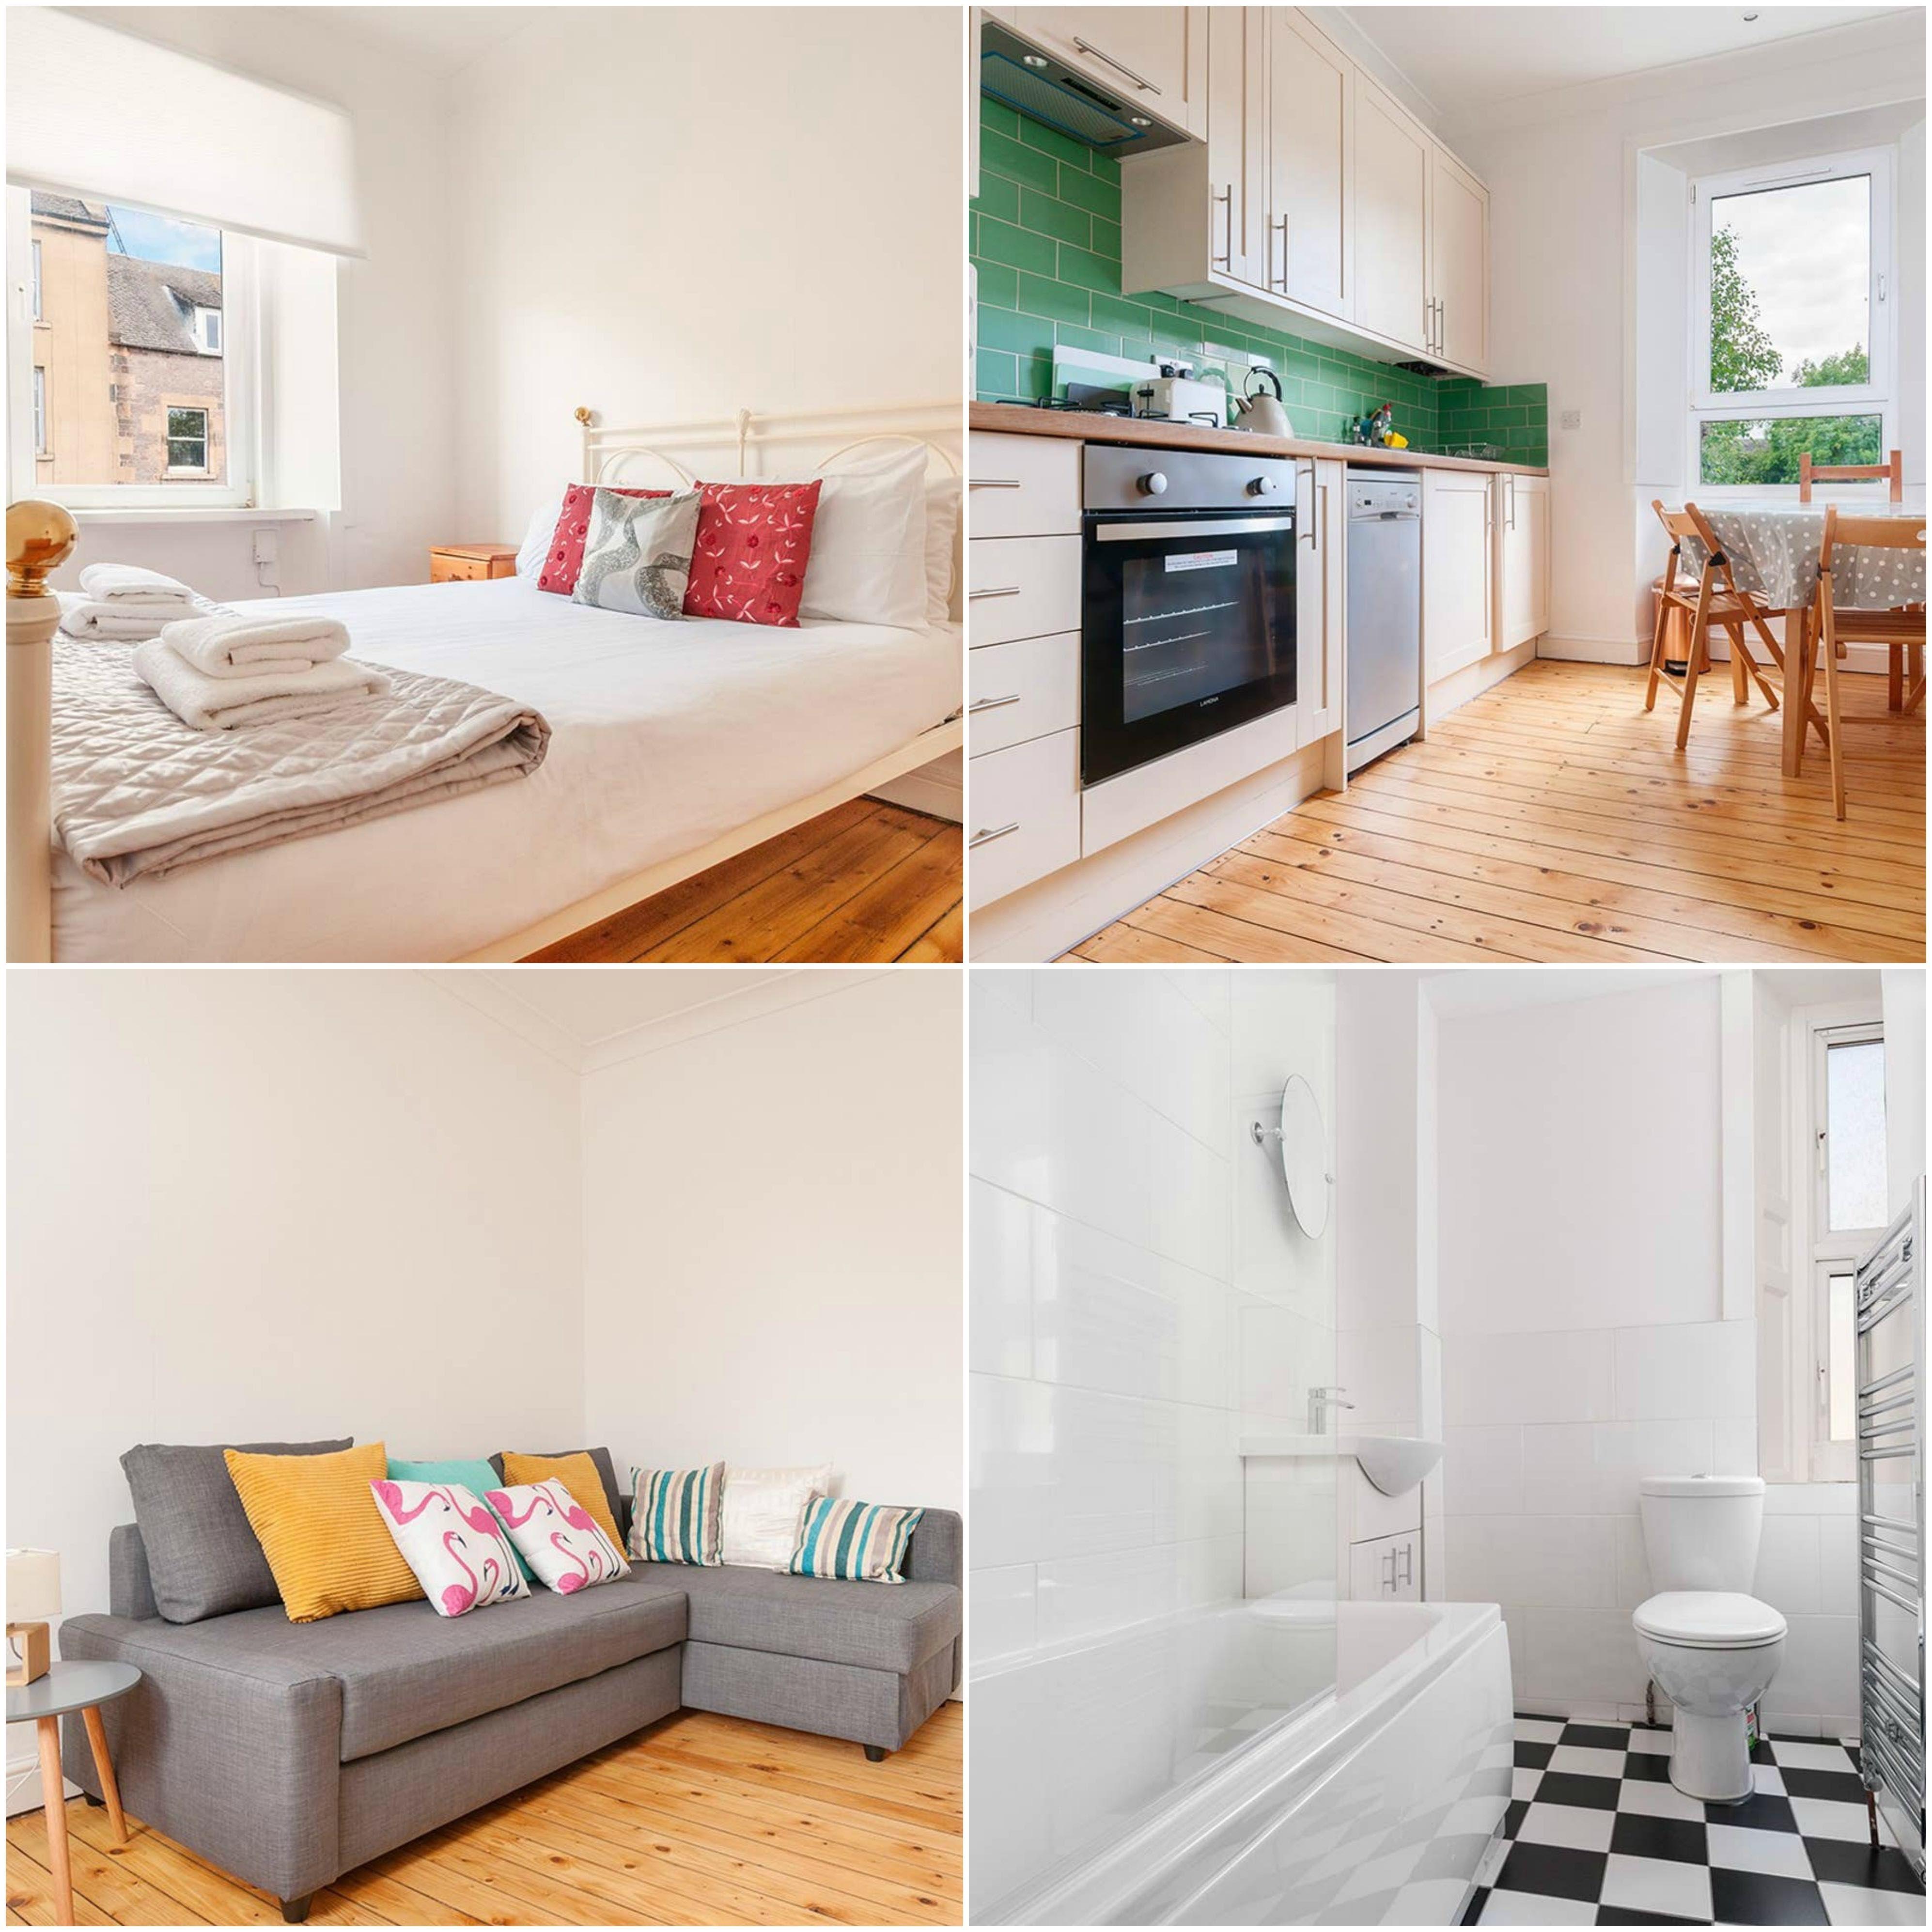 Image may contain: Rug, Bedroom, Hardwood, Furniture, Floor, Wood, Flooring, Room, Indoors, Interior Design